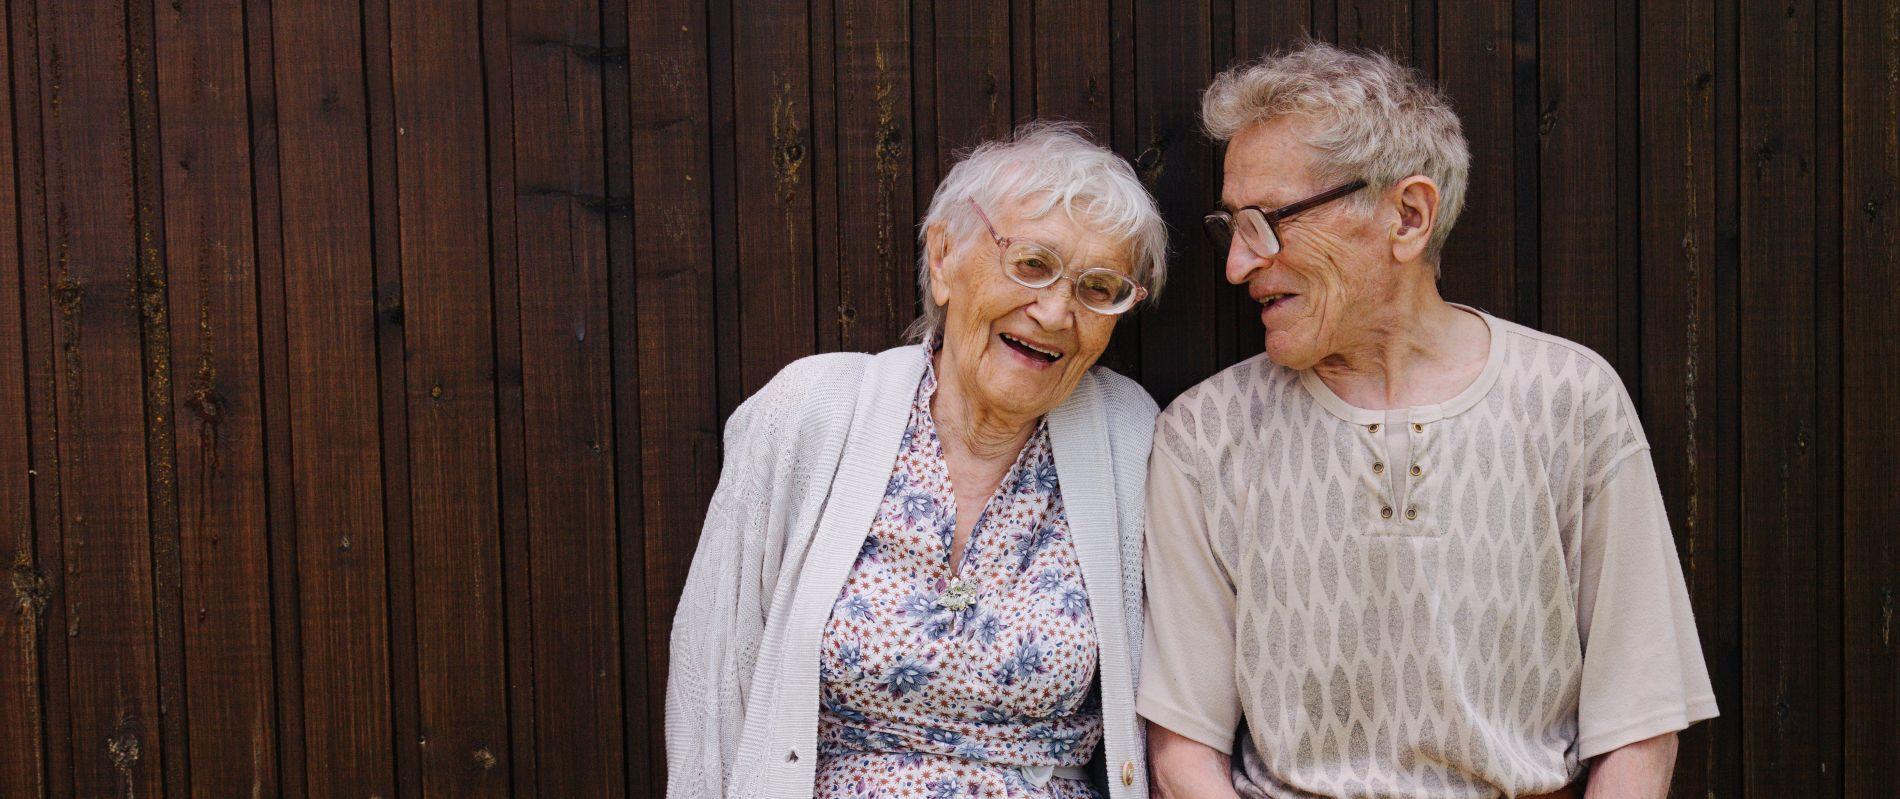 Займ без отказа пенсионерам